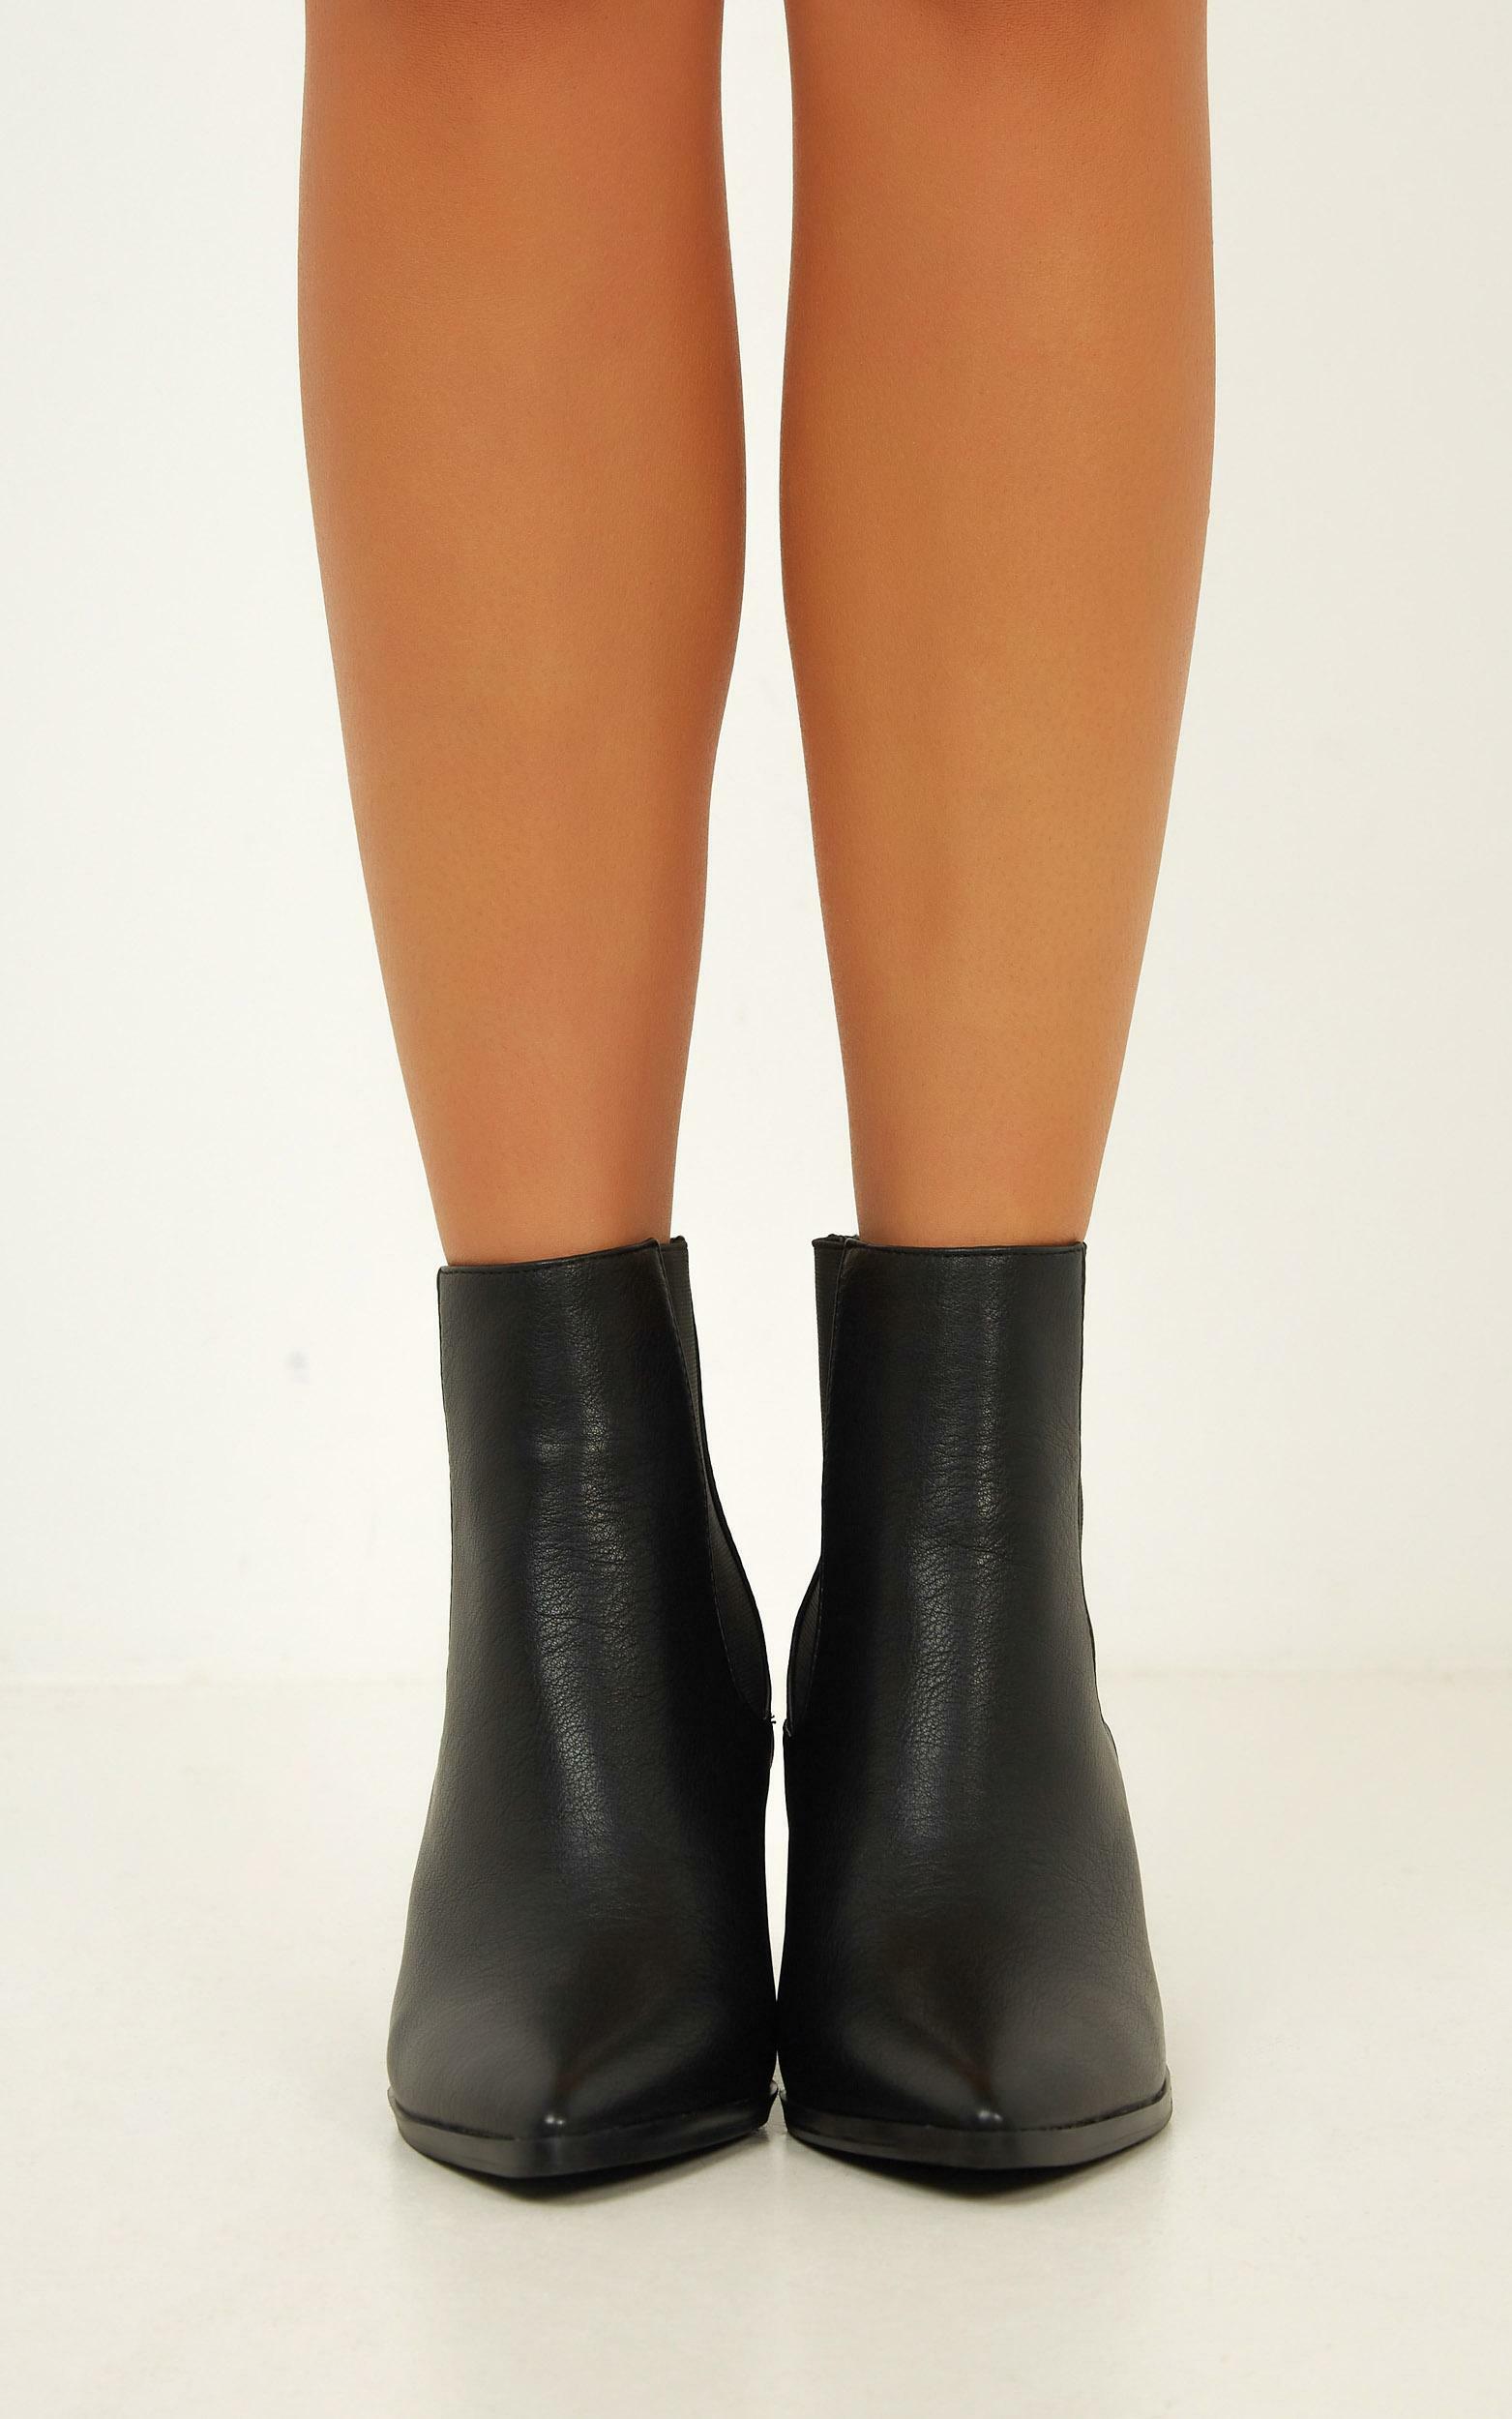 Billini - Arcadia boots in black - 10, Black, hi-res image number null